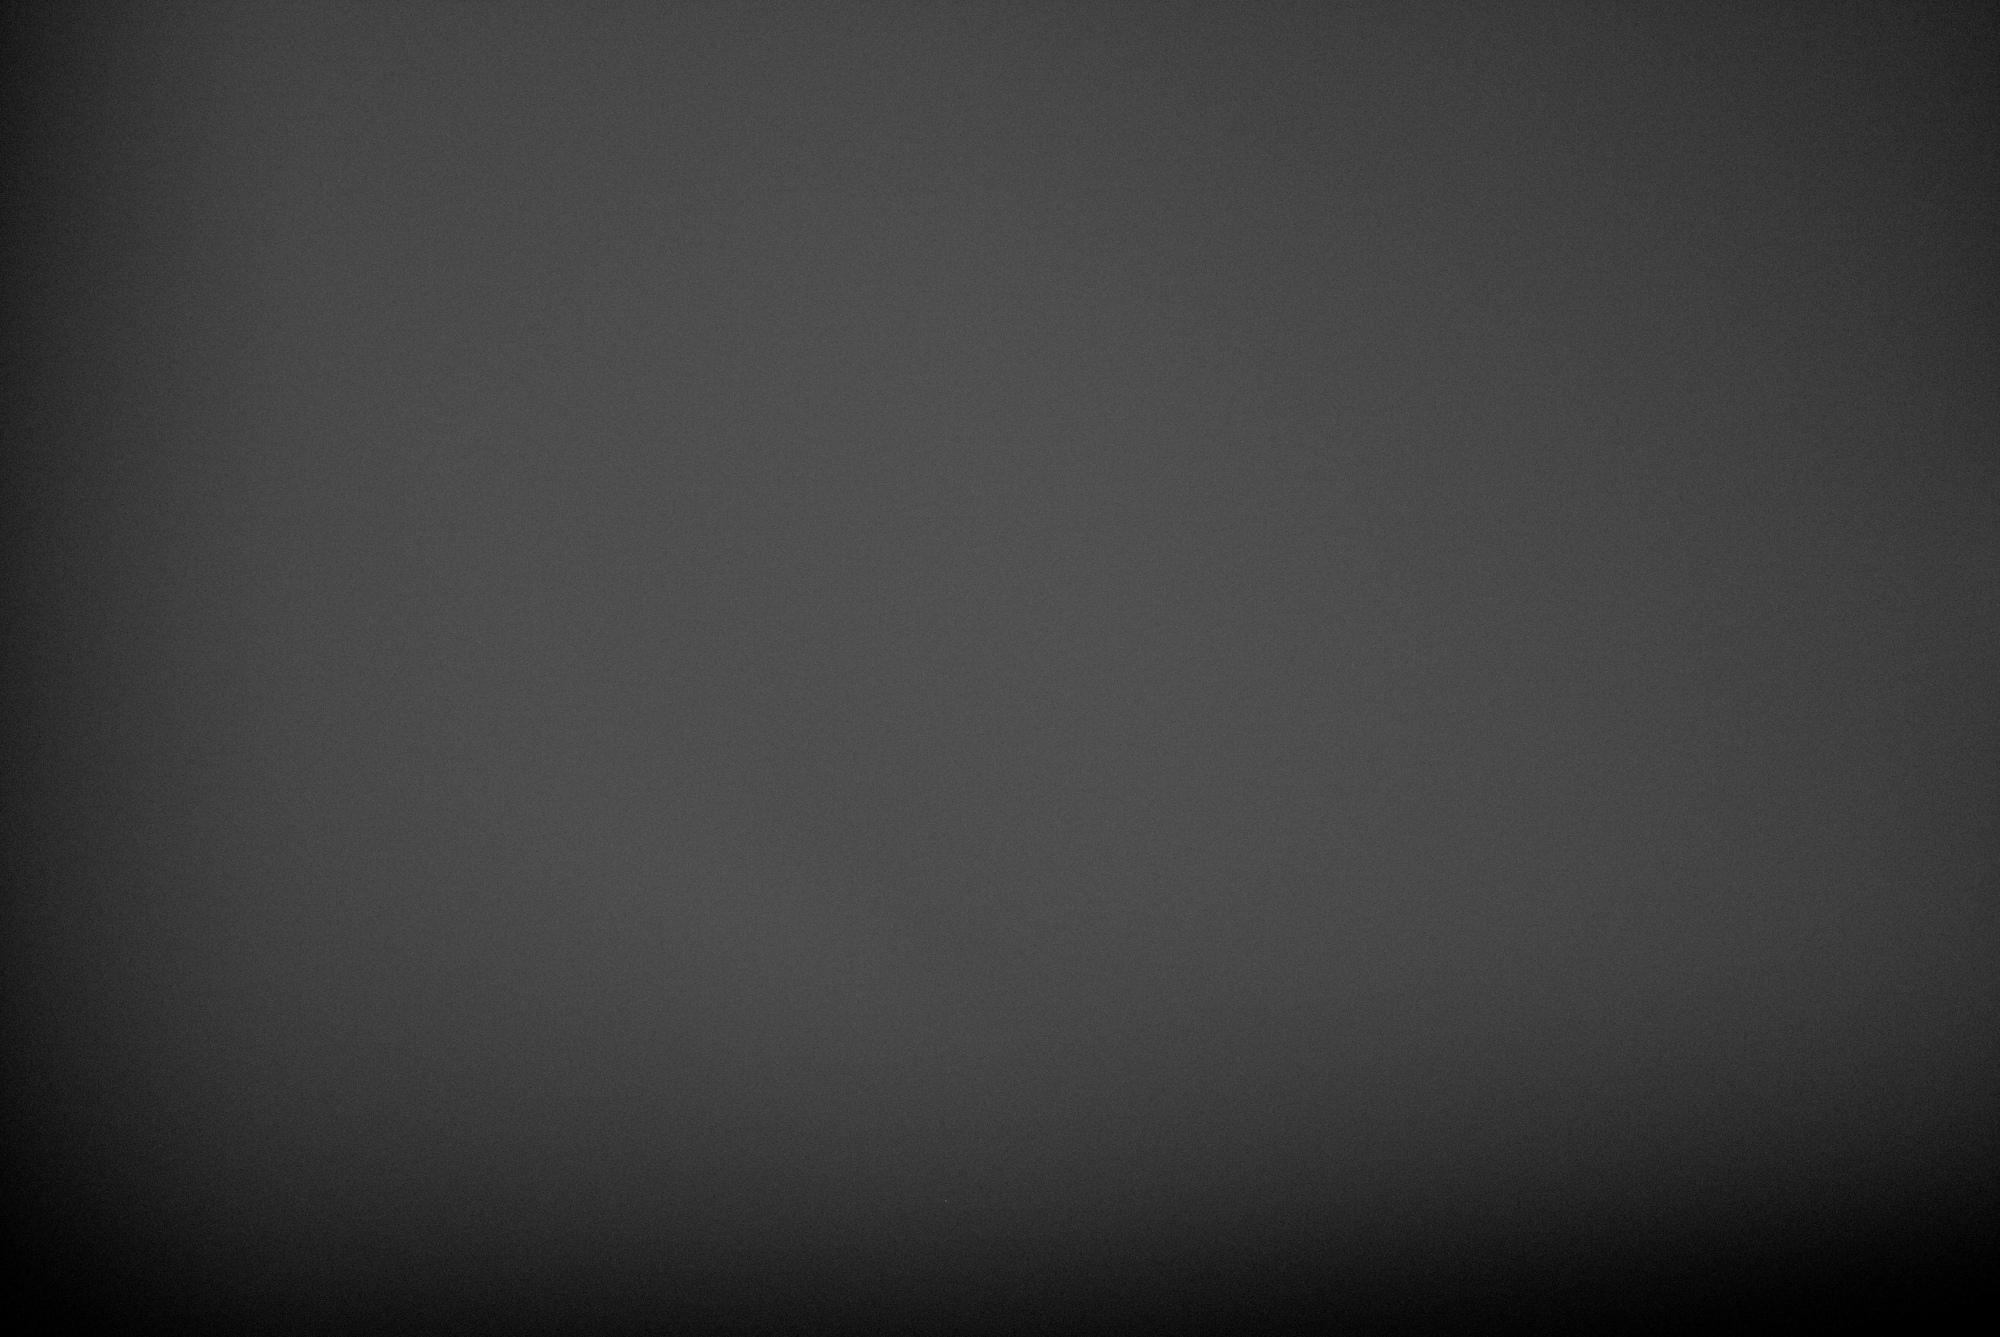 5f9552881e130_Dark120s.thumb.jpg.663efa6bf0c066b3e61f2dc901ec55a6.jpg